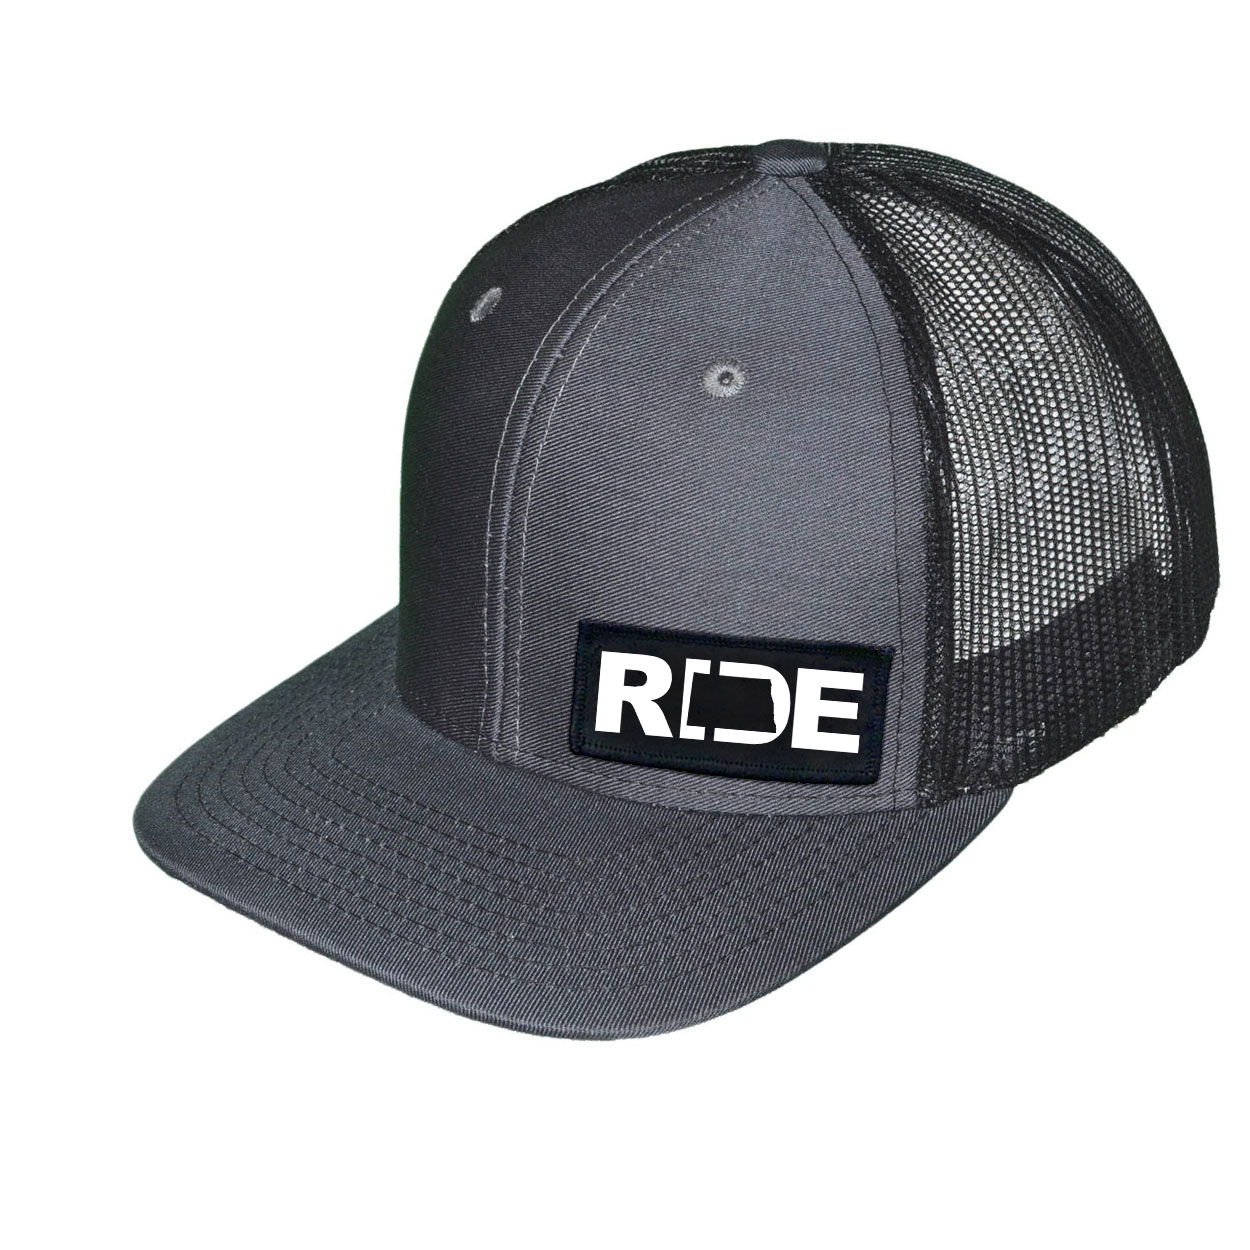 Ride North Dakota Night Out Woven Patch Snapback Trucker Hat Dark Gray/Black (White Logo)